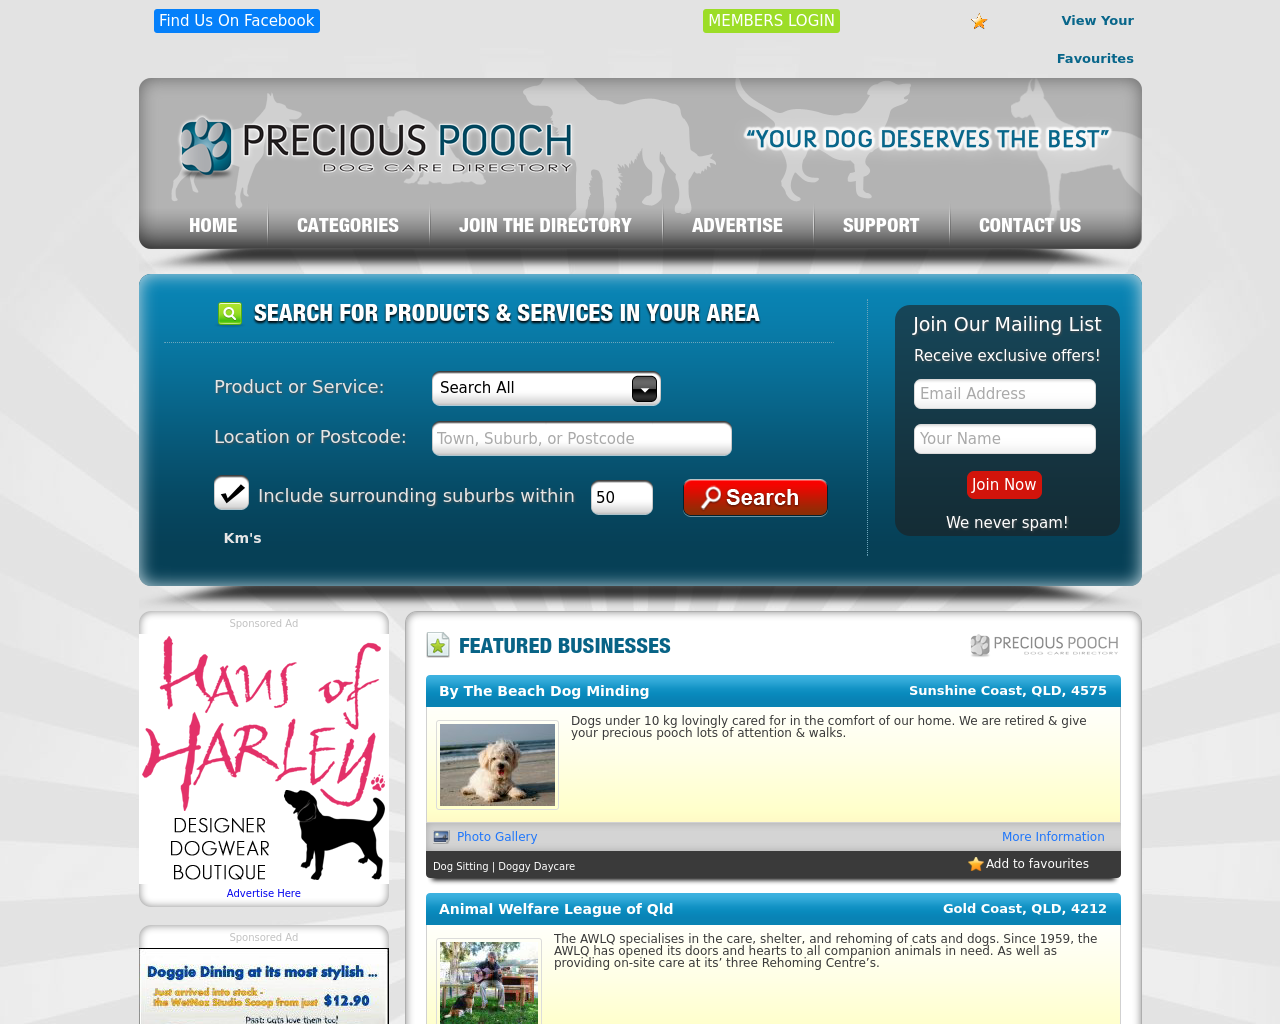 Precious-Pooch-Advertising-Reviews-Pricing